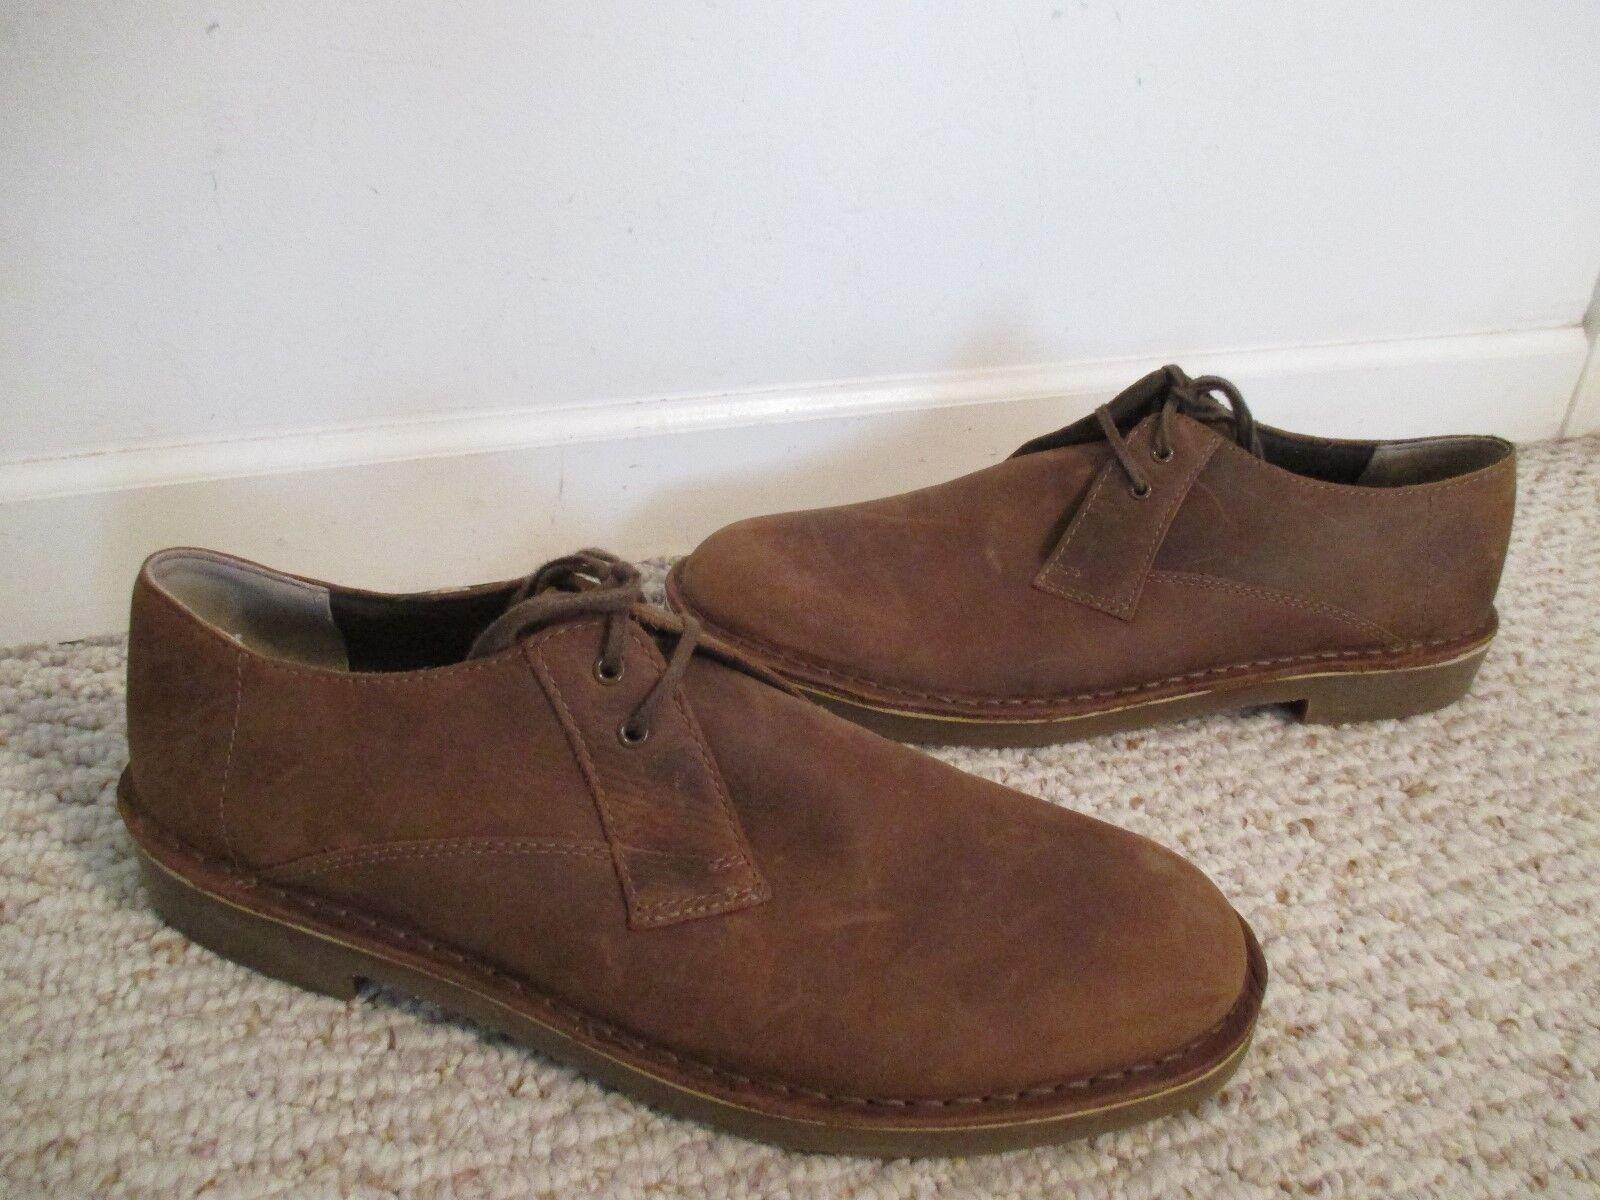 Scarpe casual da uomo Clarks Bushacre Nubuck Brown Leather Oxford Shoes Size 11.5 uomos  34023